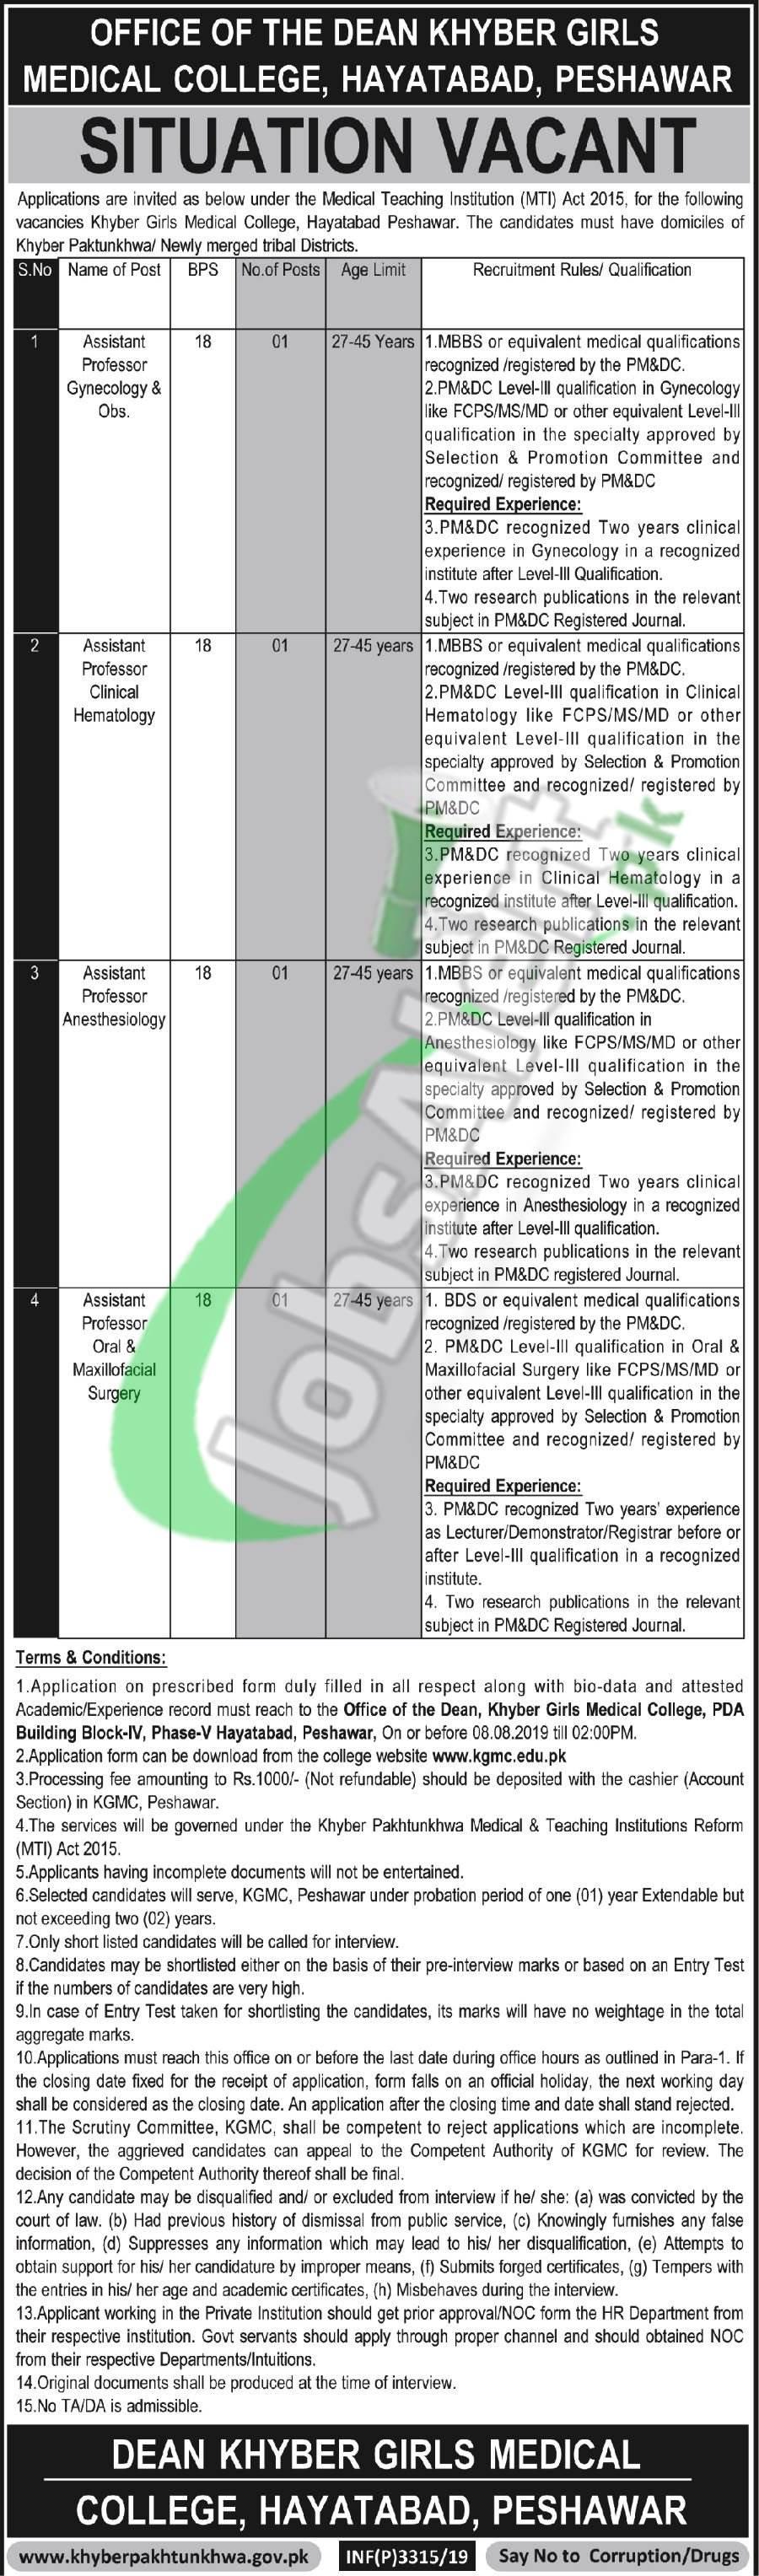 KGMC Peshawar Jobs